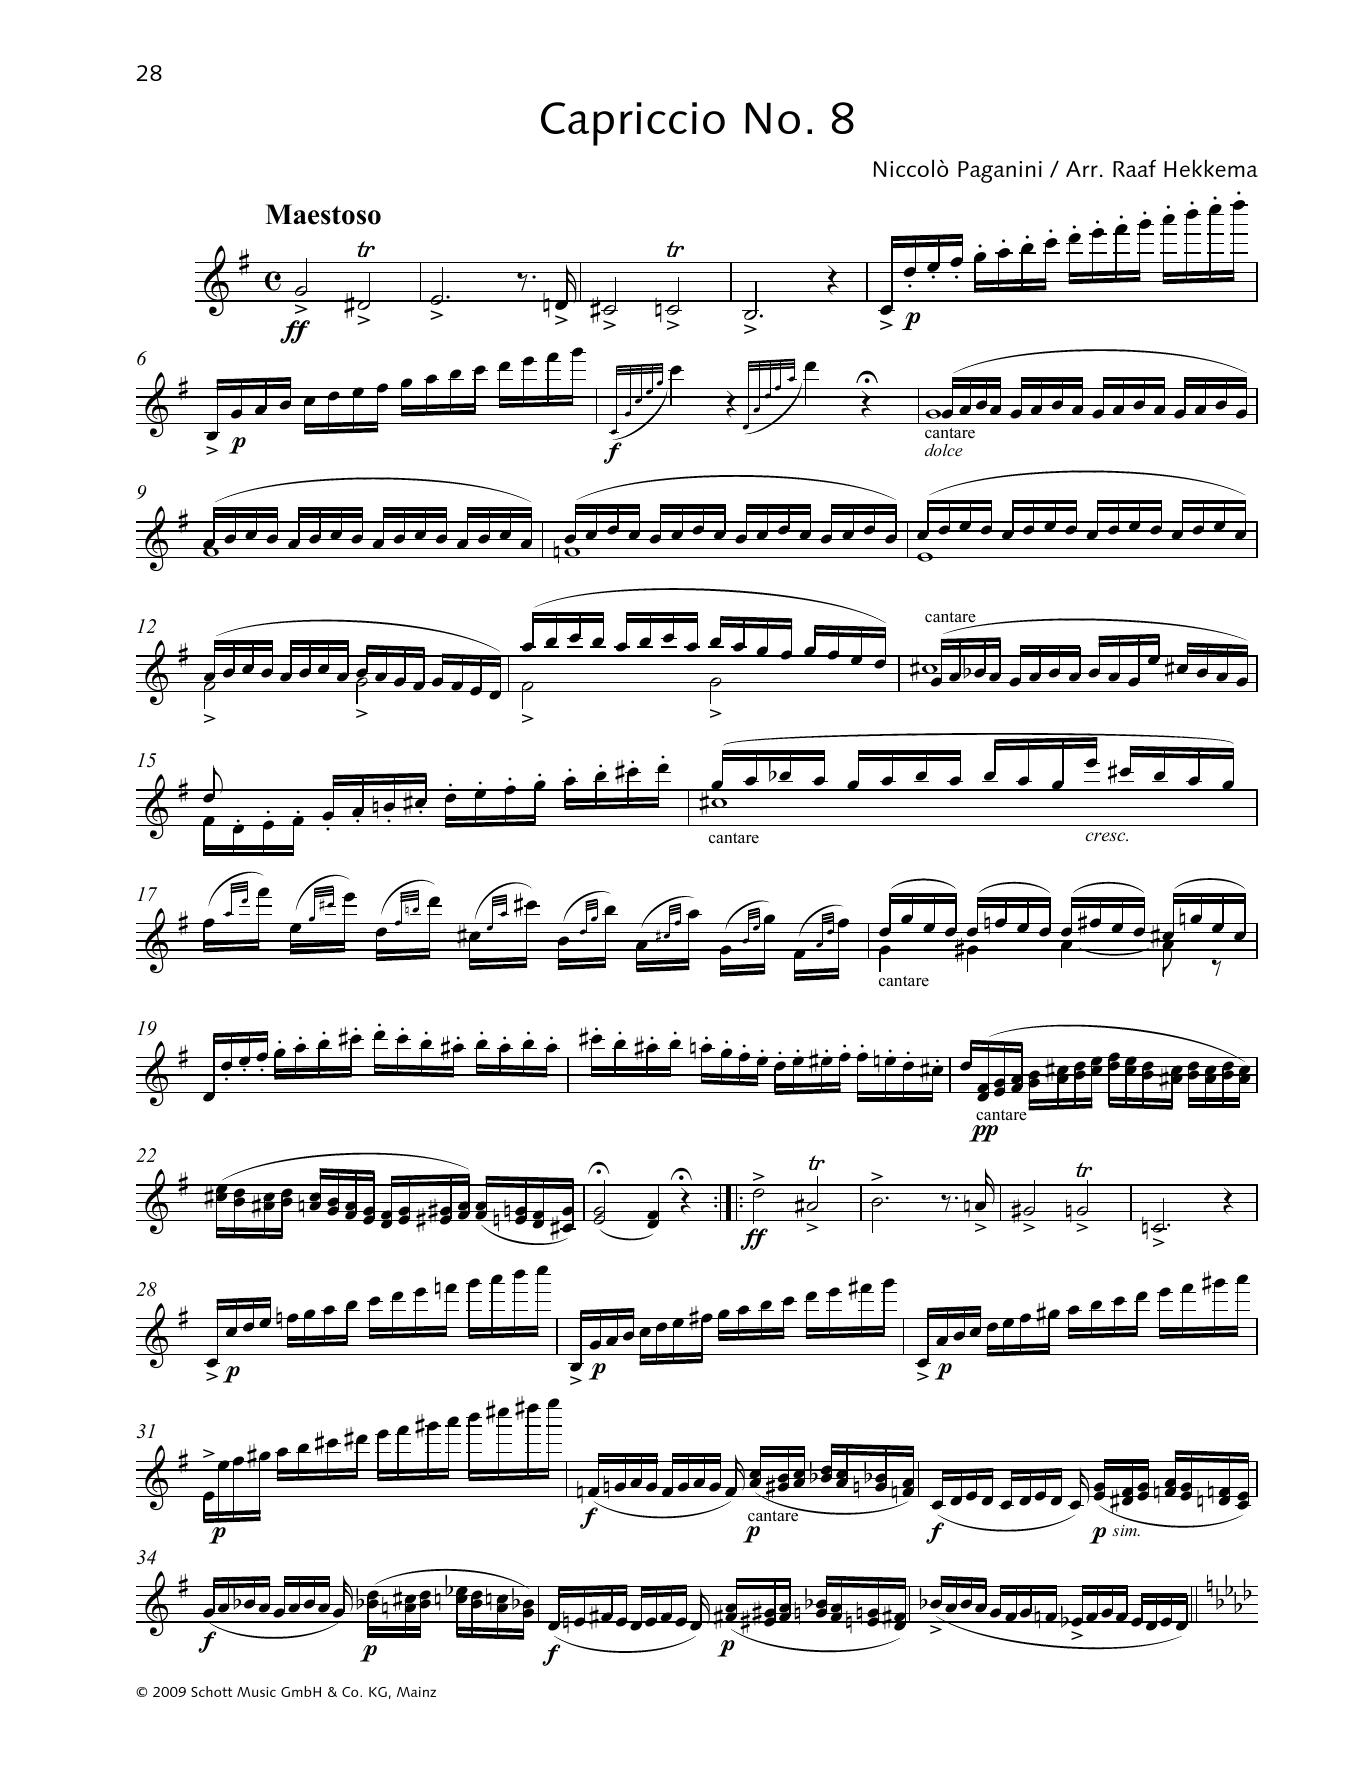 Capriccio No. 8 Sheet Music